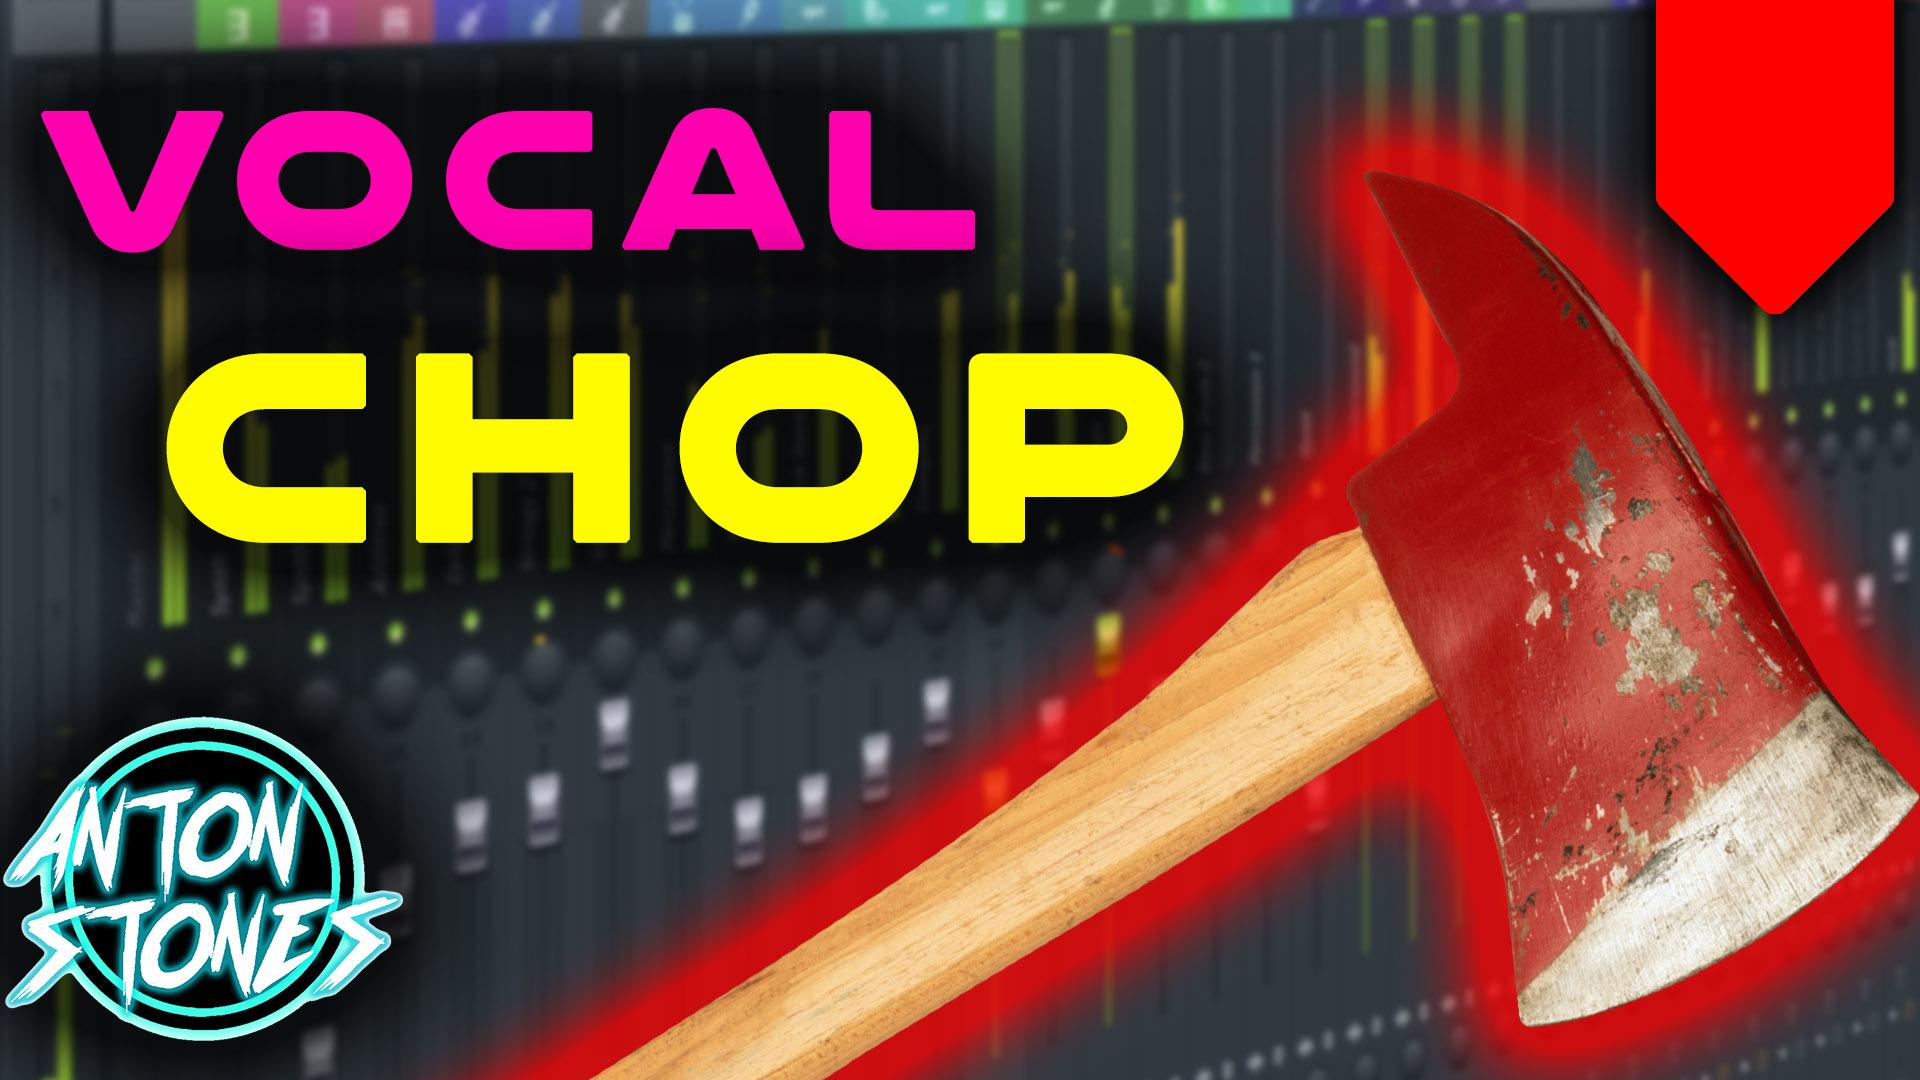 vocal chop.jpg